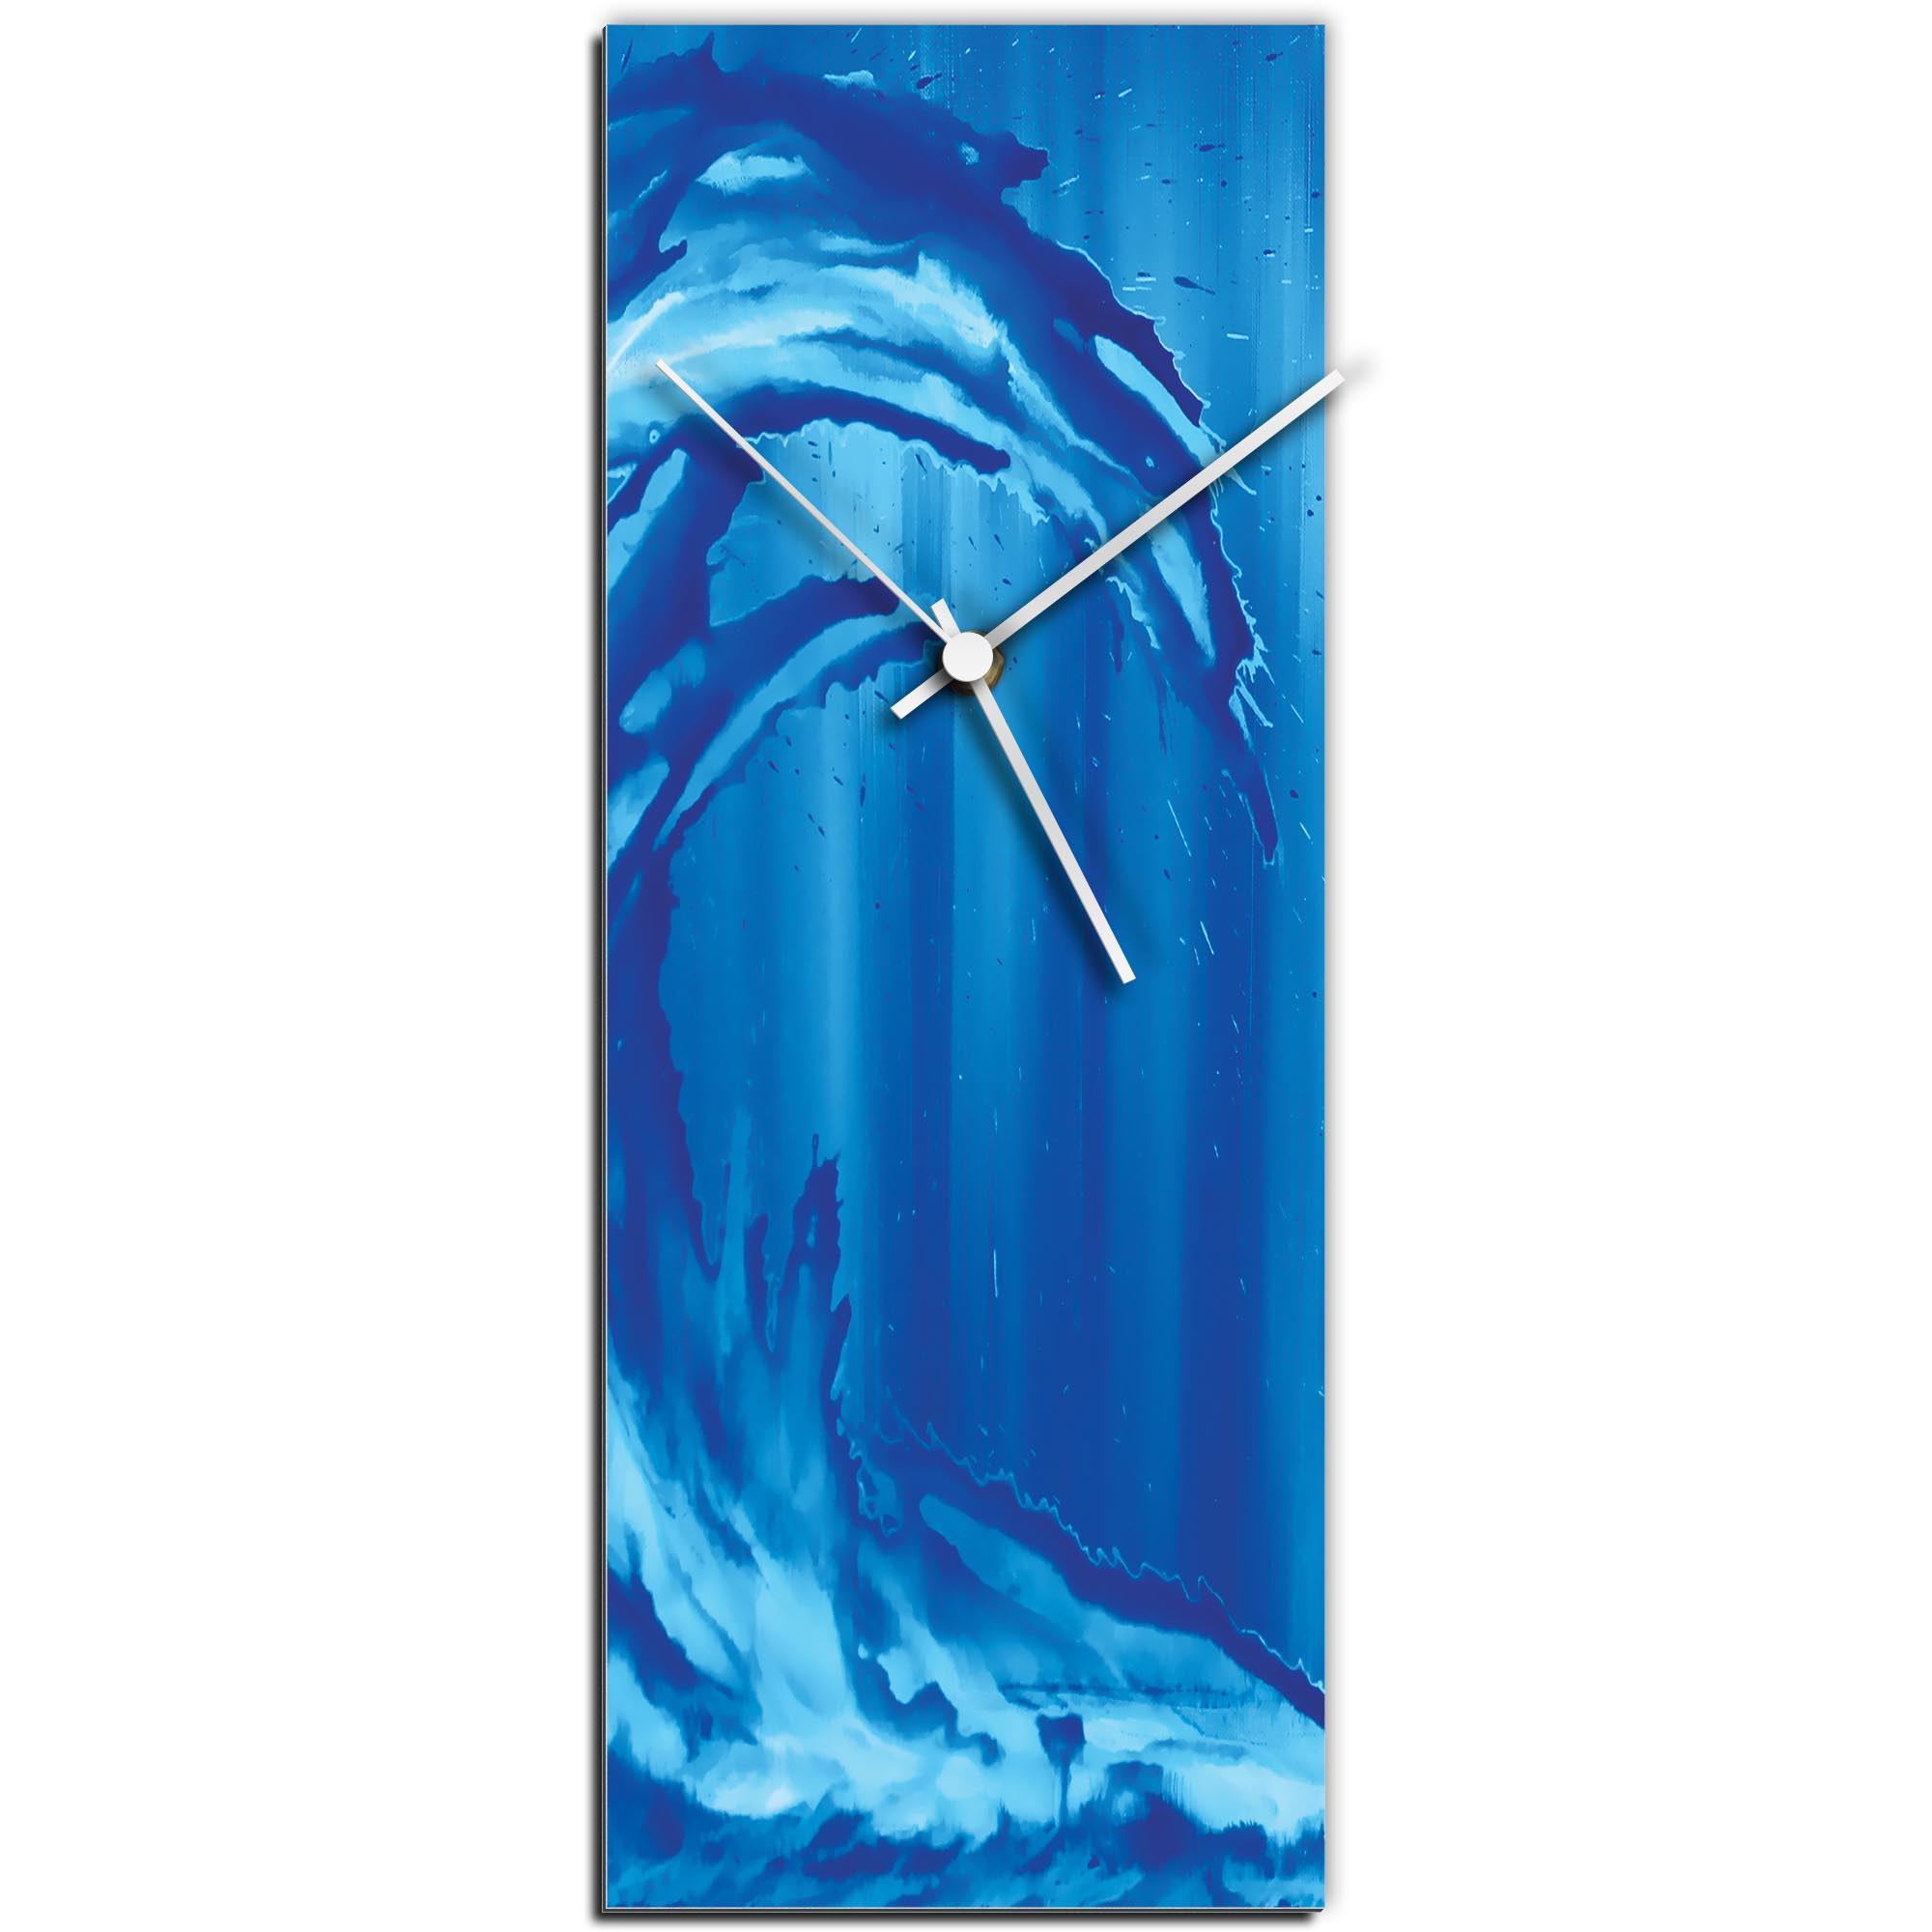 Mendo Vasilevski 'Blue Wave v1 Clock Large' 9in x 24in Modern Wall Clock on Aluminum Composite